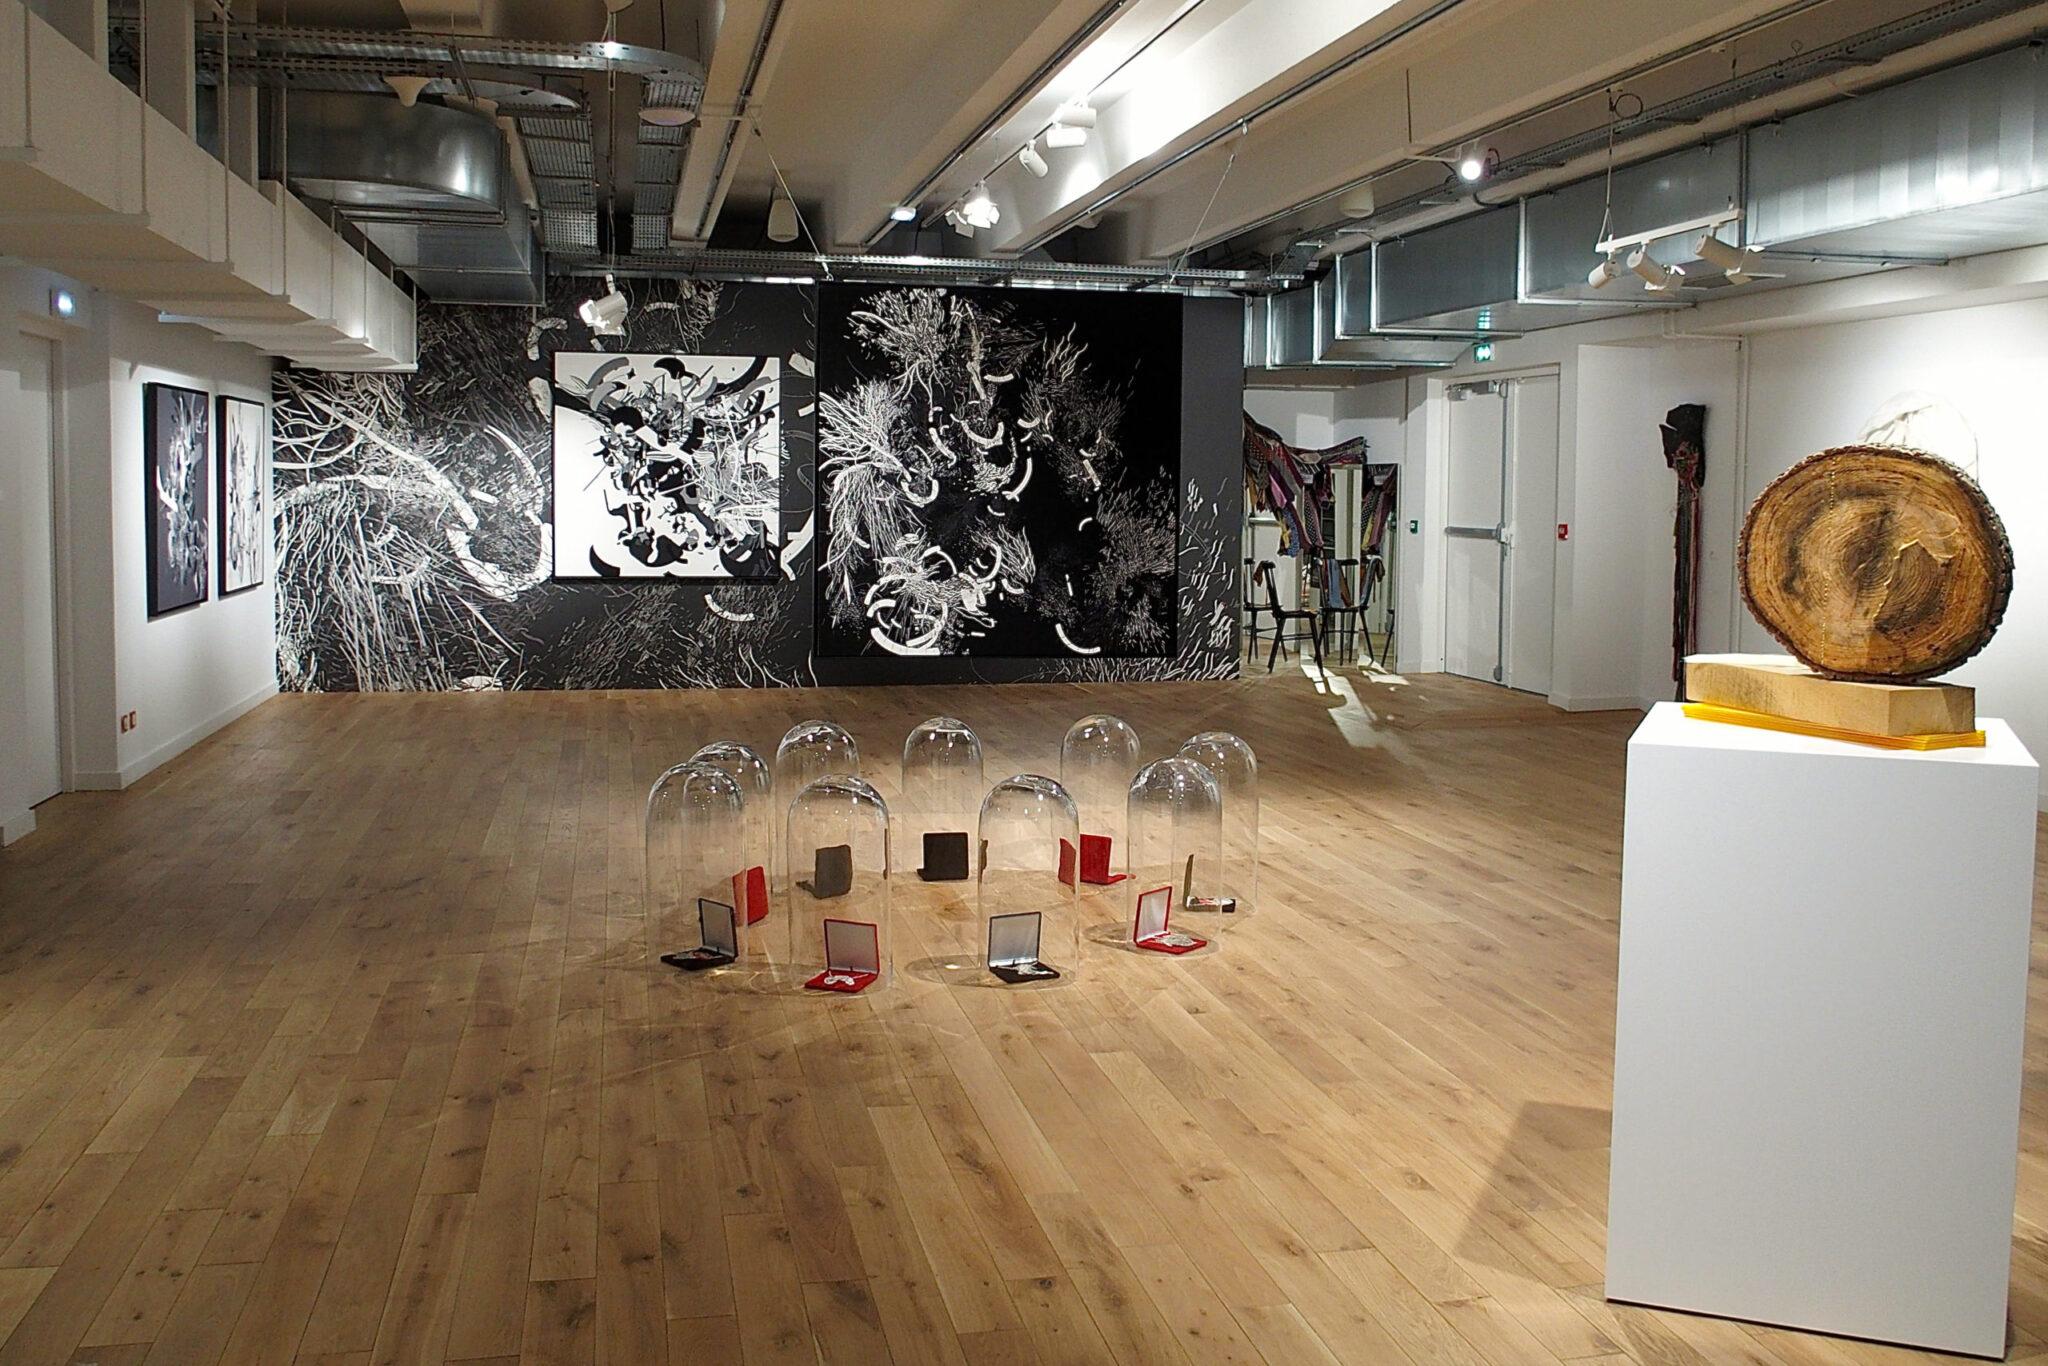 audrey-hatchikian-gallery-flagrant-délire-sacha-haillote-rodolphe-barsikian-expo-art-contemporain-6